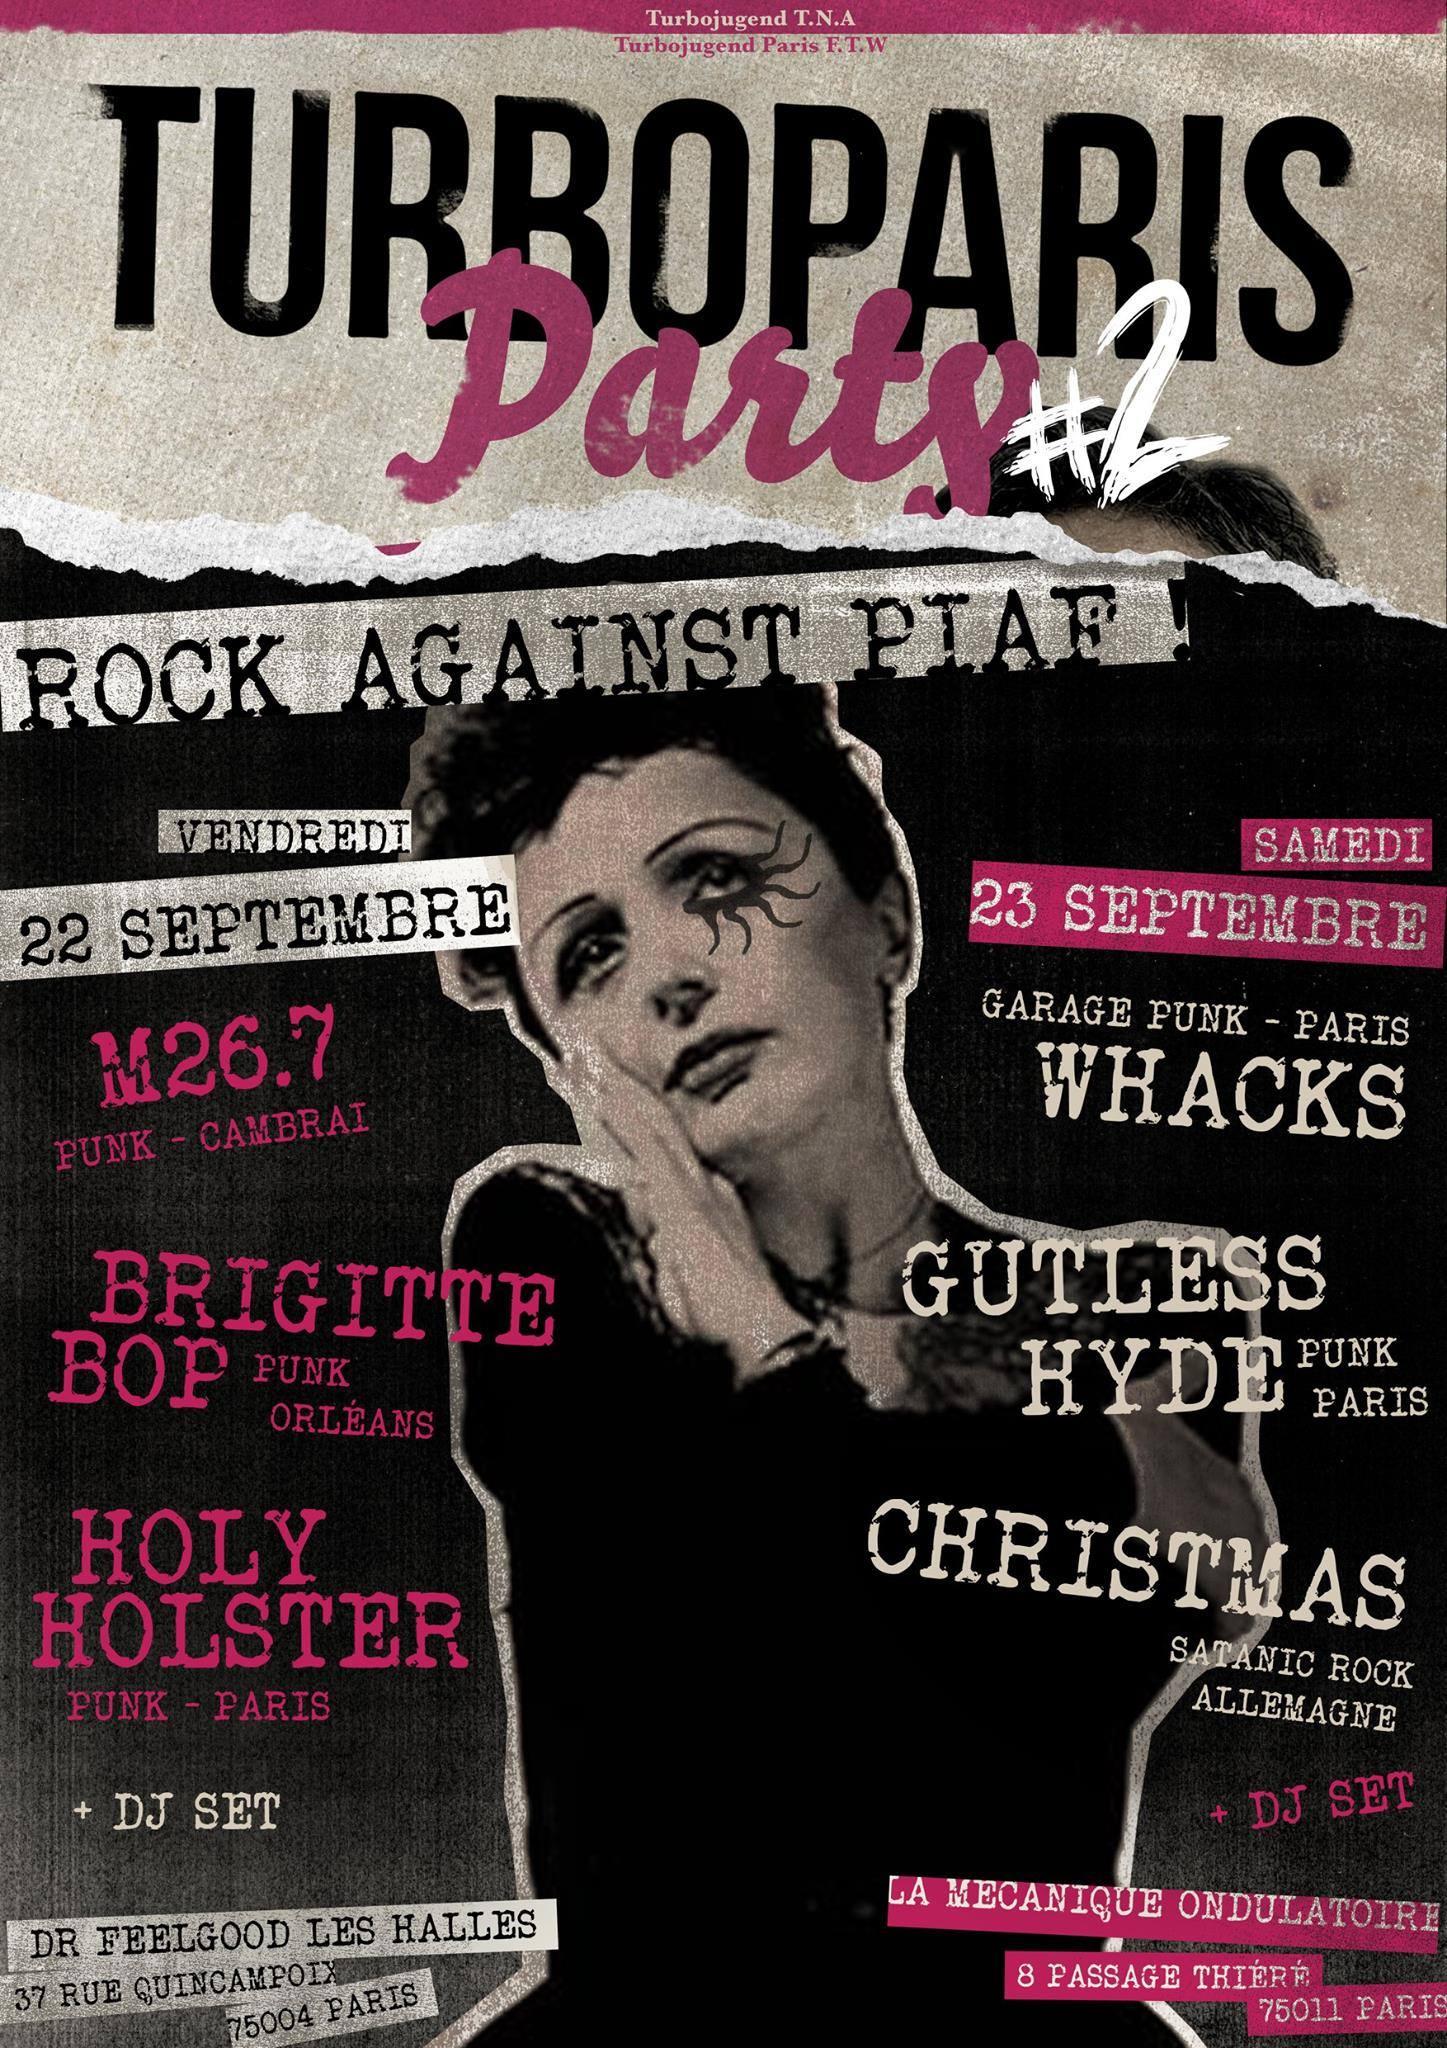 TURBO PARIS PARTY // 23.09